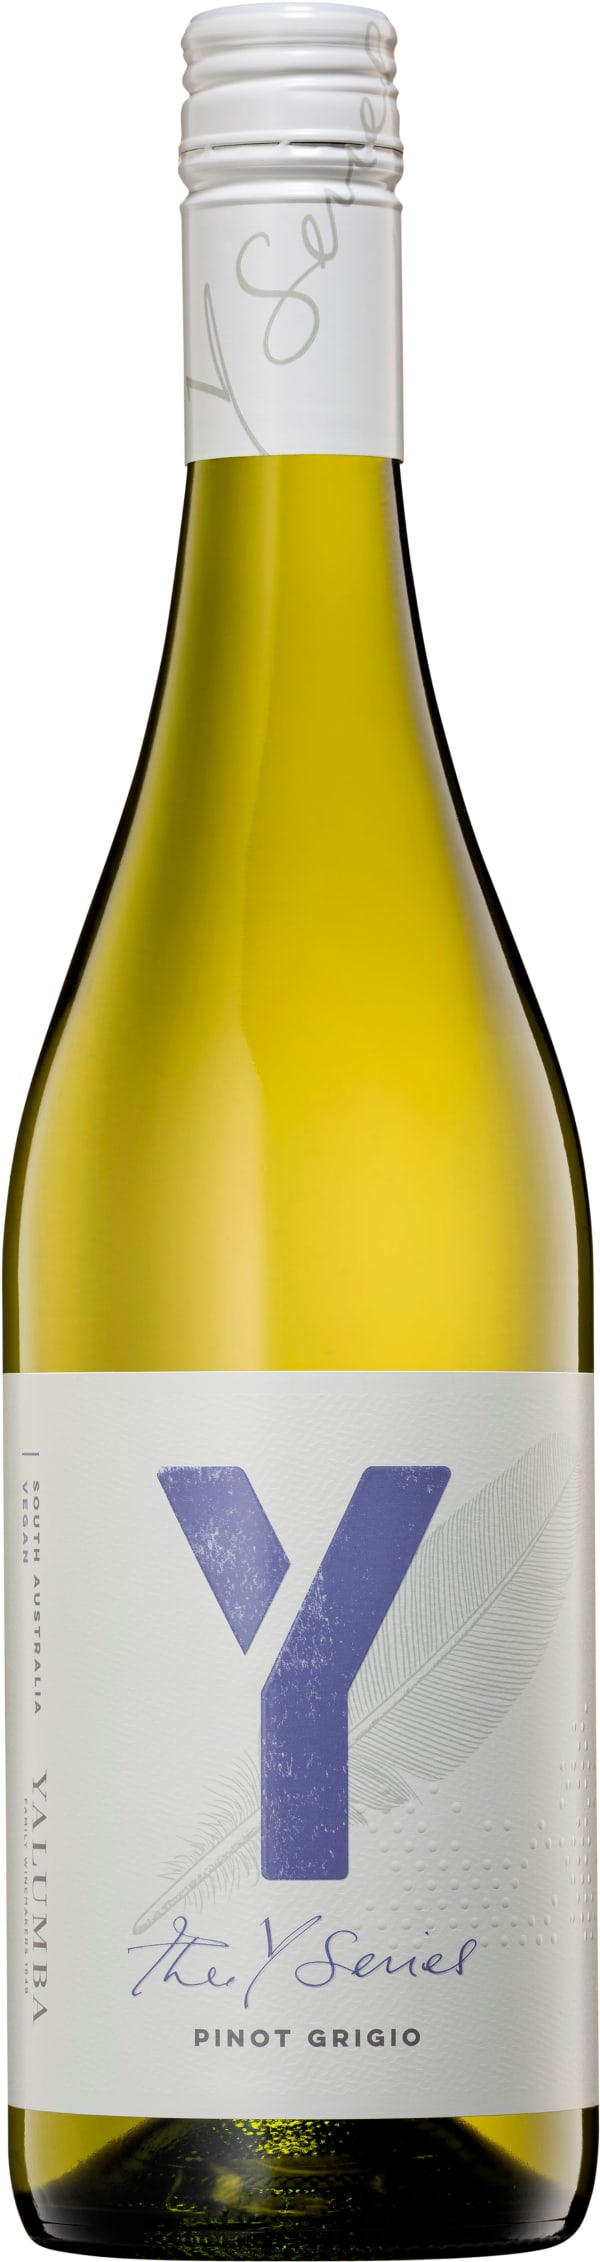 Yalumba Y Series Pinot Grigio 2020